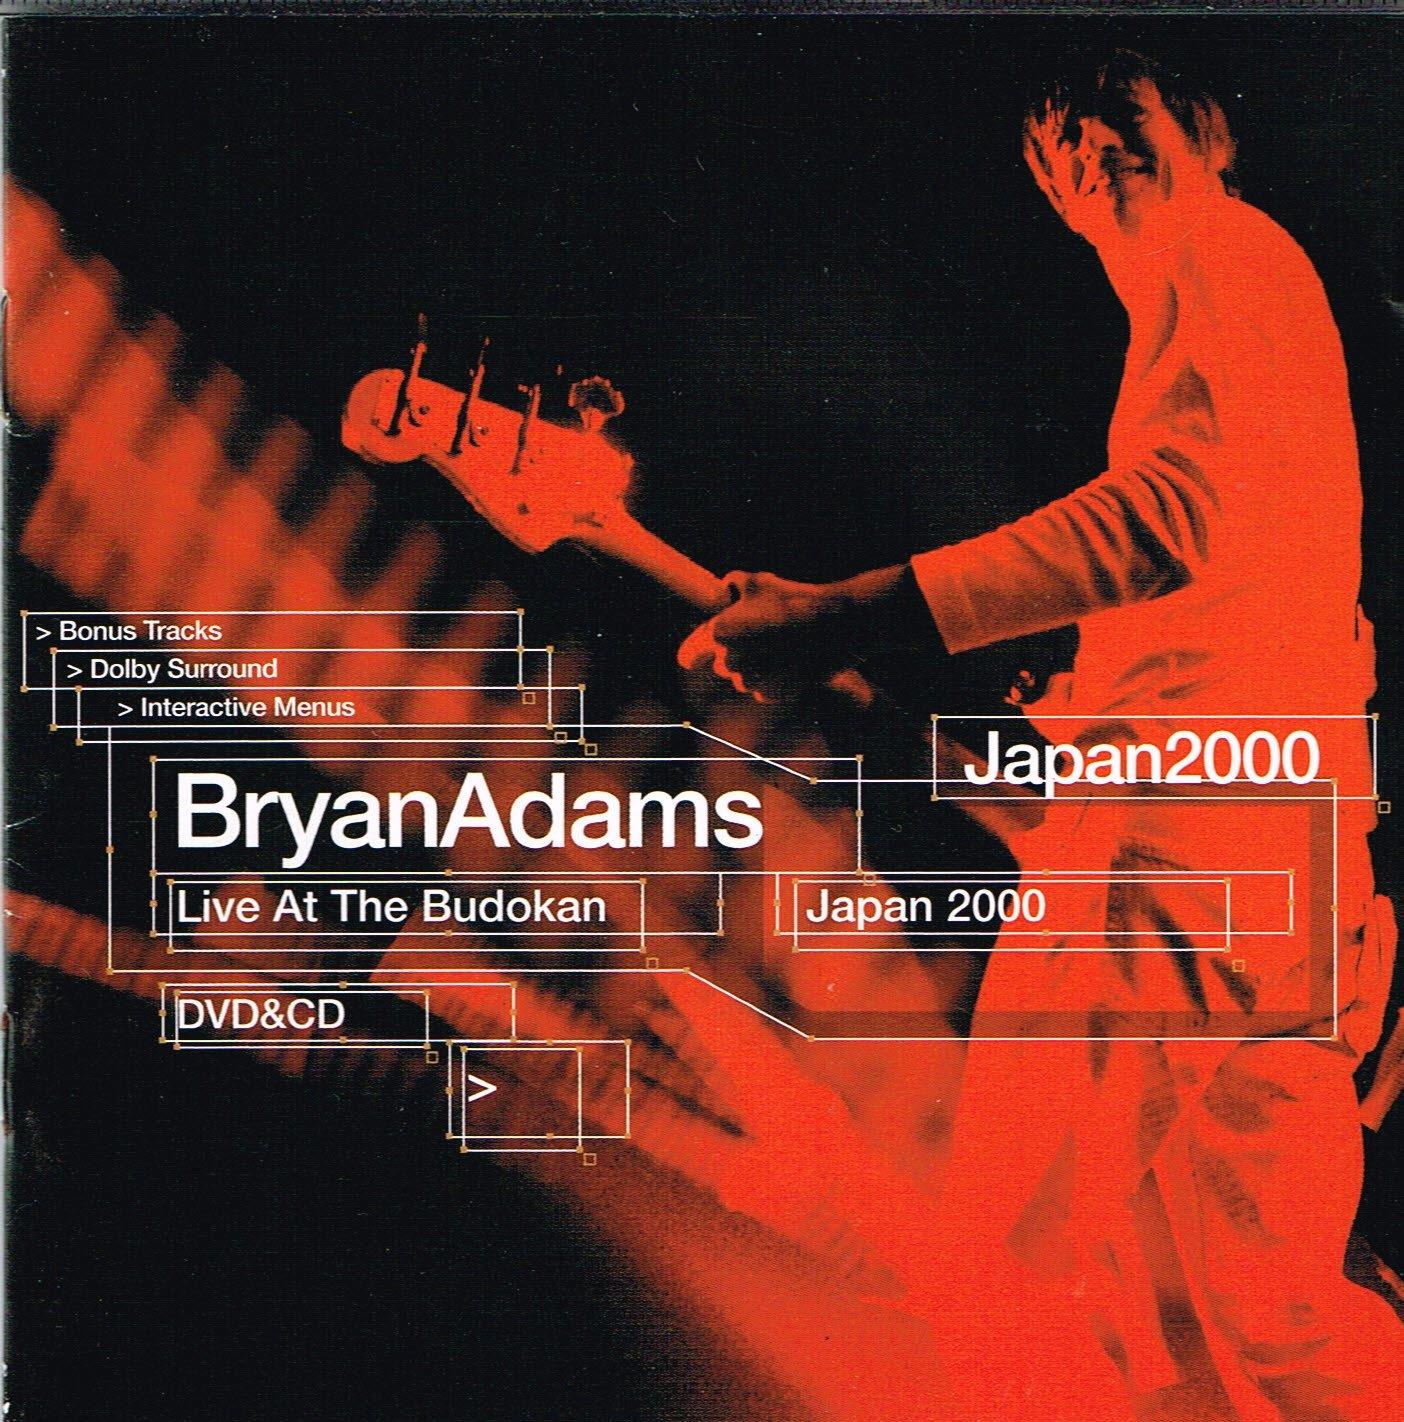 Bryan Adams Live at the Budokan (CD & DVD)